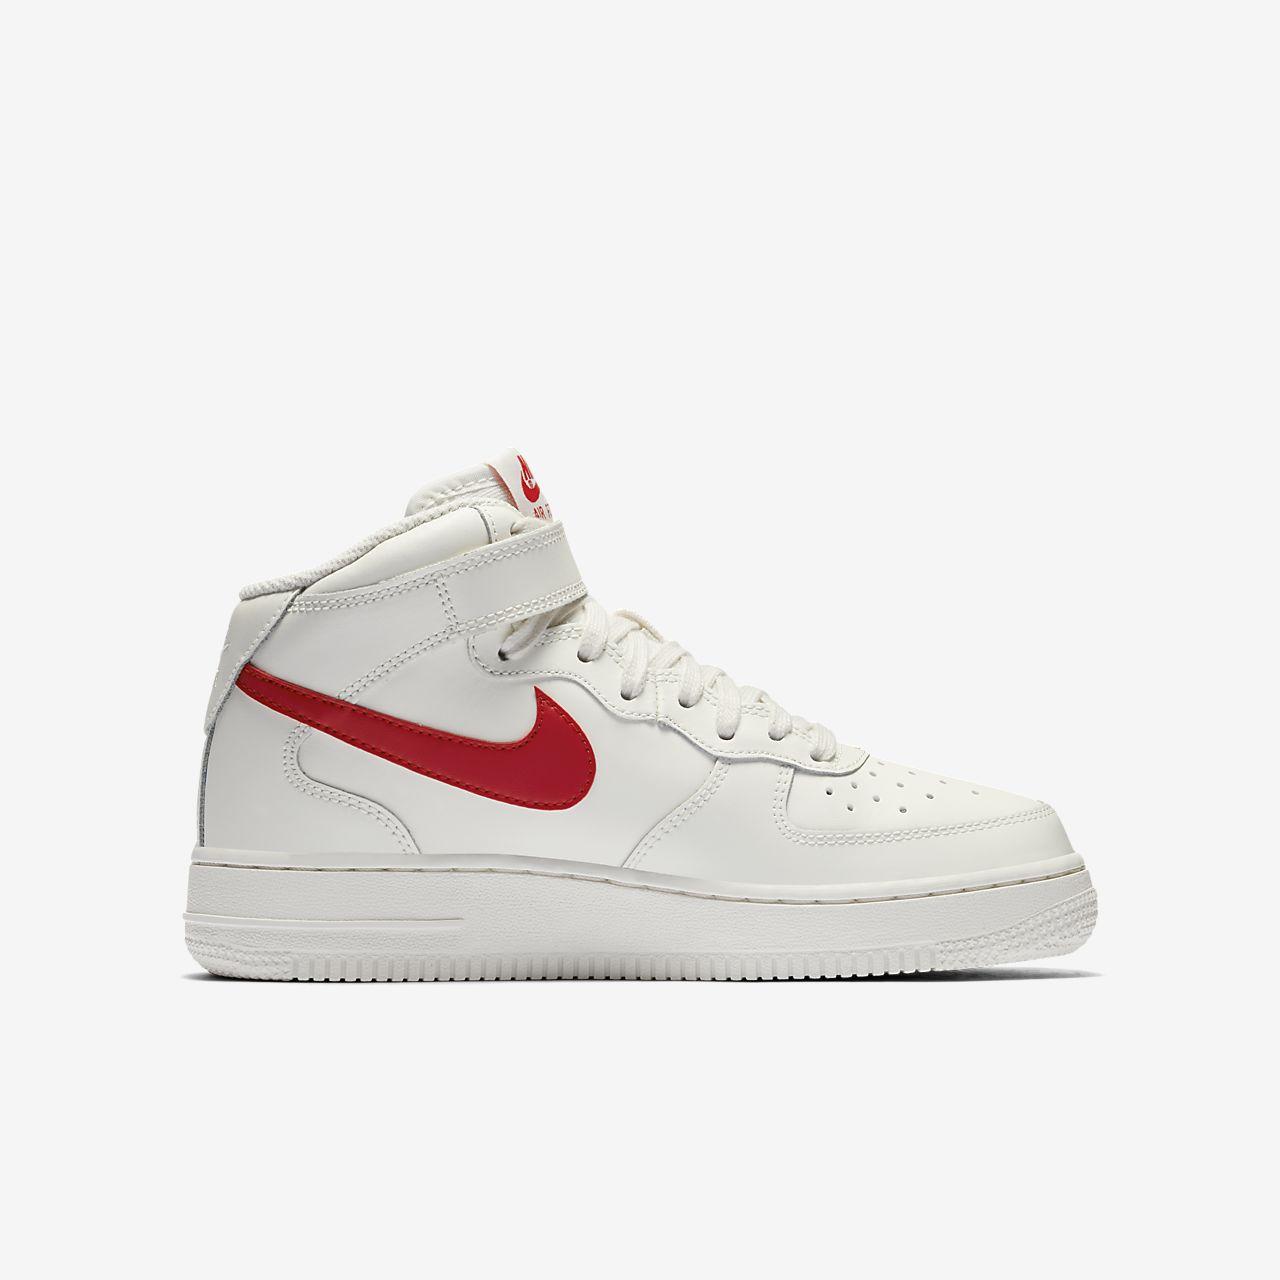 Nike Lv8 Air Force 1 07 Lv8 Nike Zapatos Blancos Guru Del Estilo De Moda d728d9